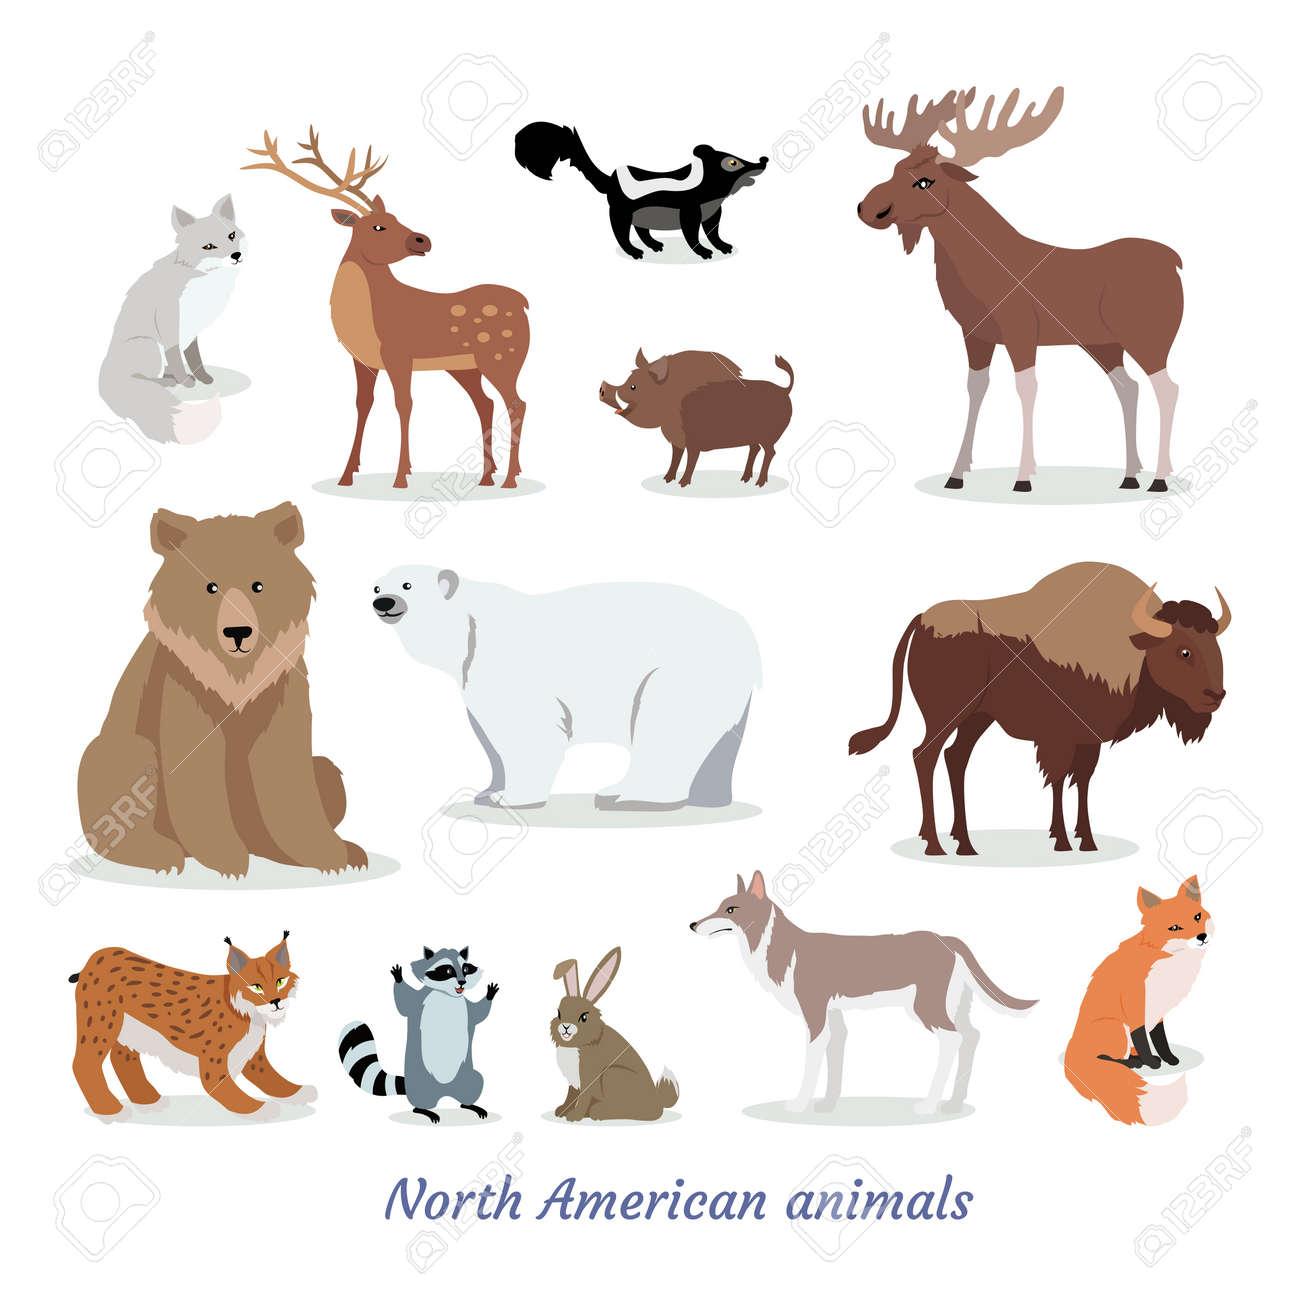 North American Animal Cartoon Flat Icons Set illustration. - 92331529